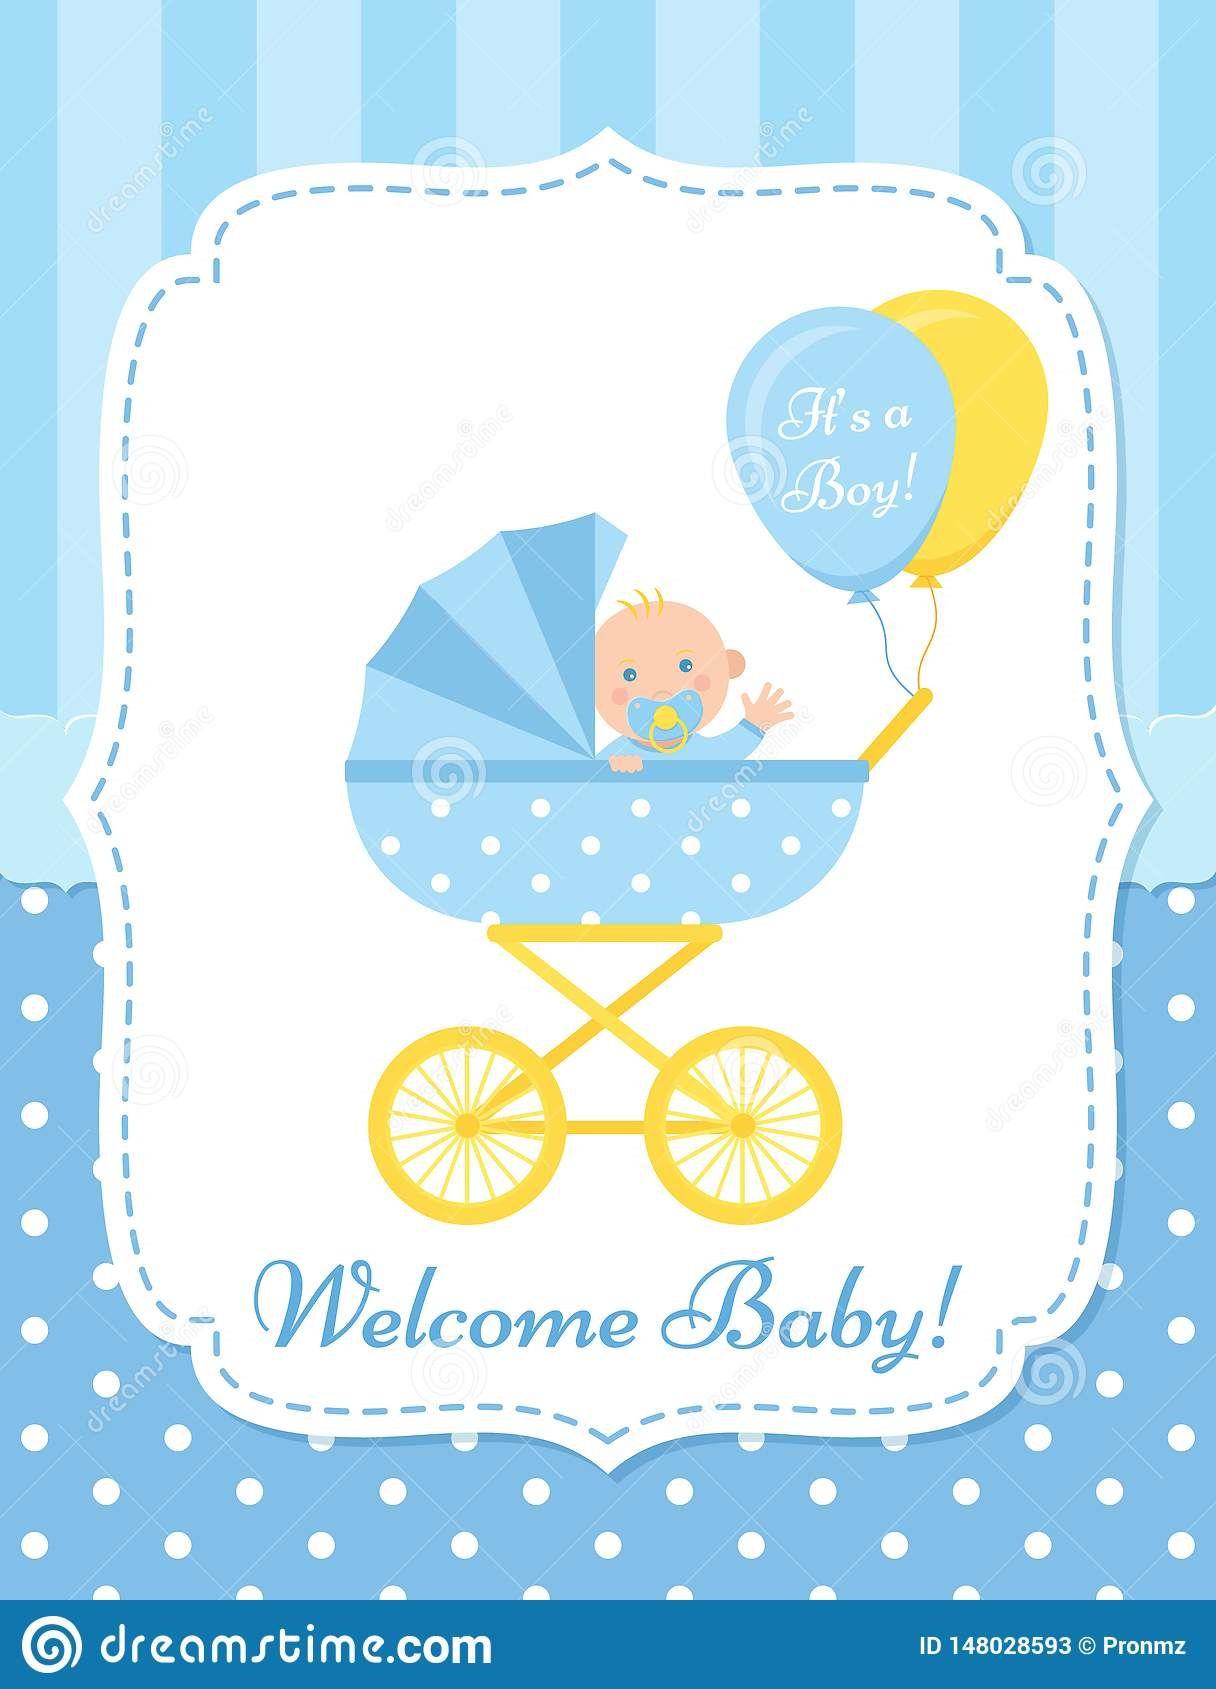 004 Striking Free Printable Baby Shower Card For Boy High Definition  BingoFull